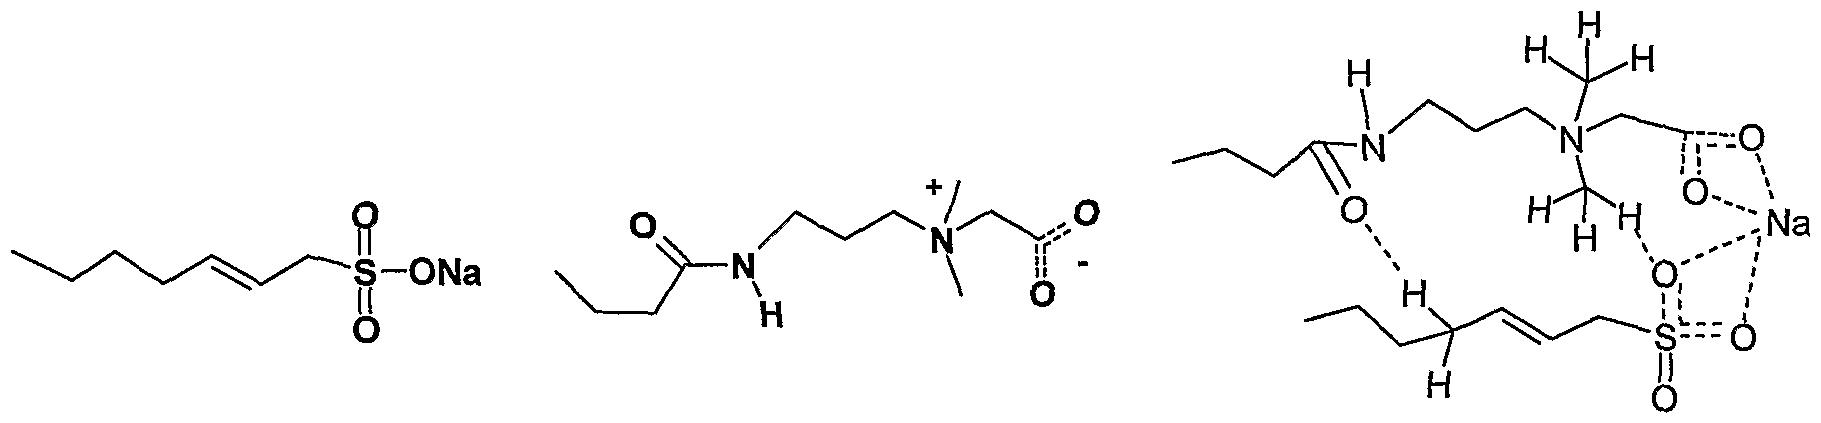 Patent WO2010068082A1 - Composici�n espumante para alta ...